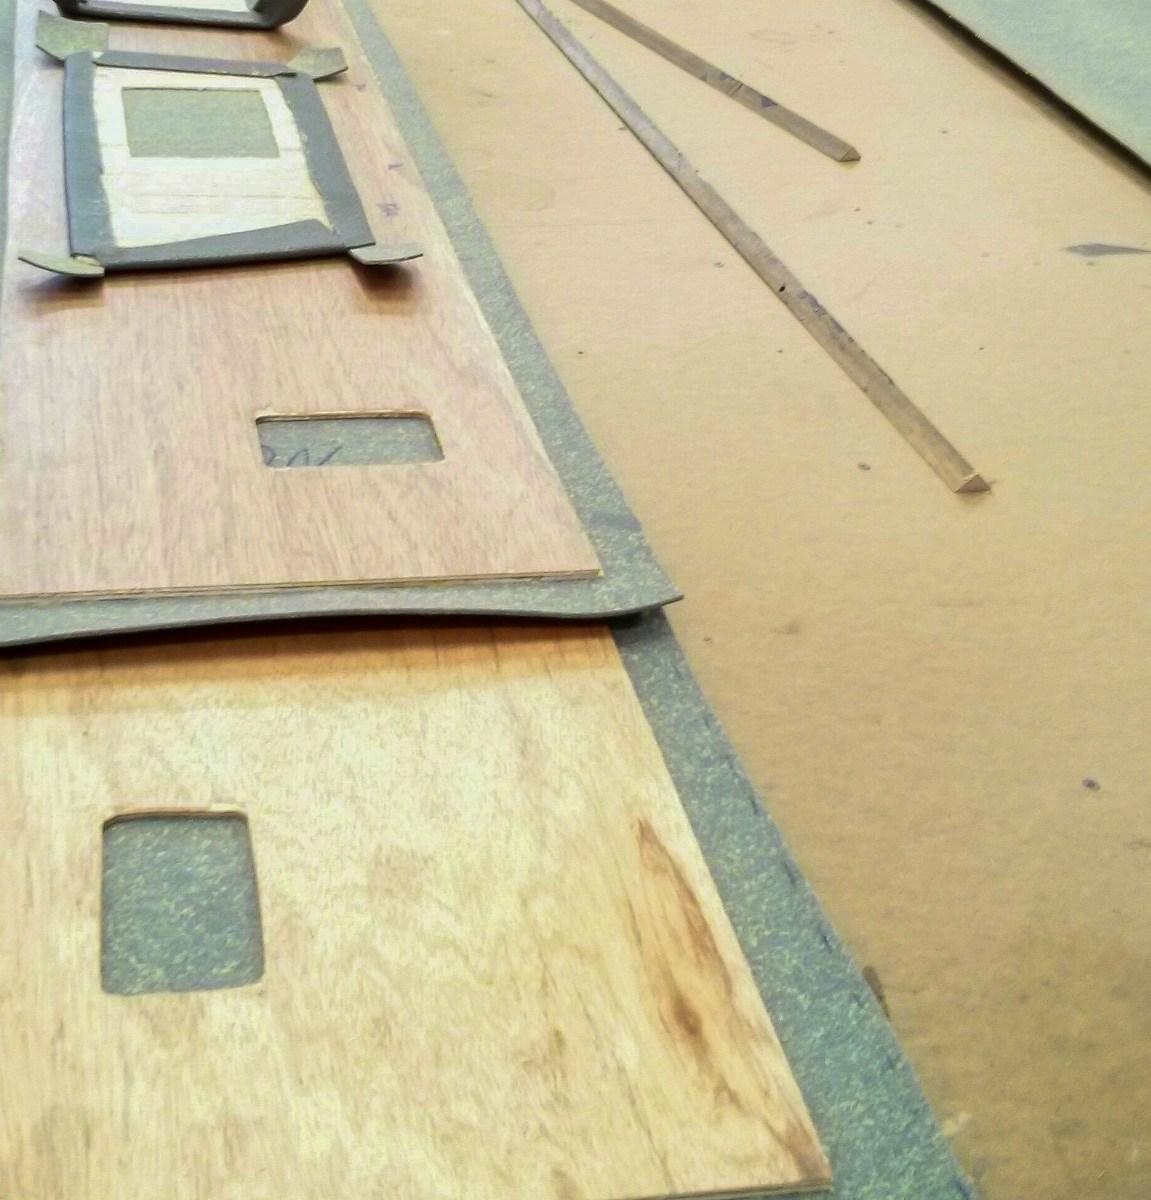 Contact Adhesive Foam To Wall Panels Sprinter Adventure Van